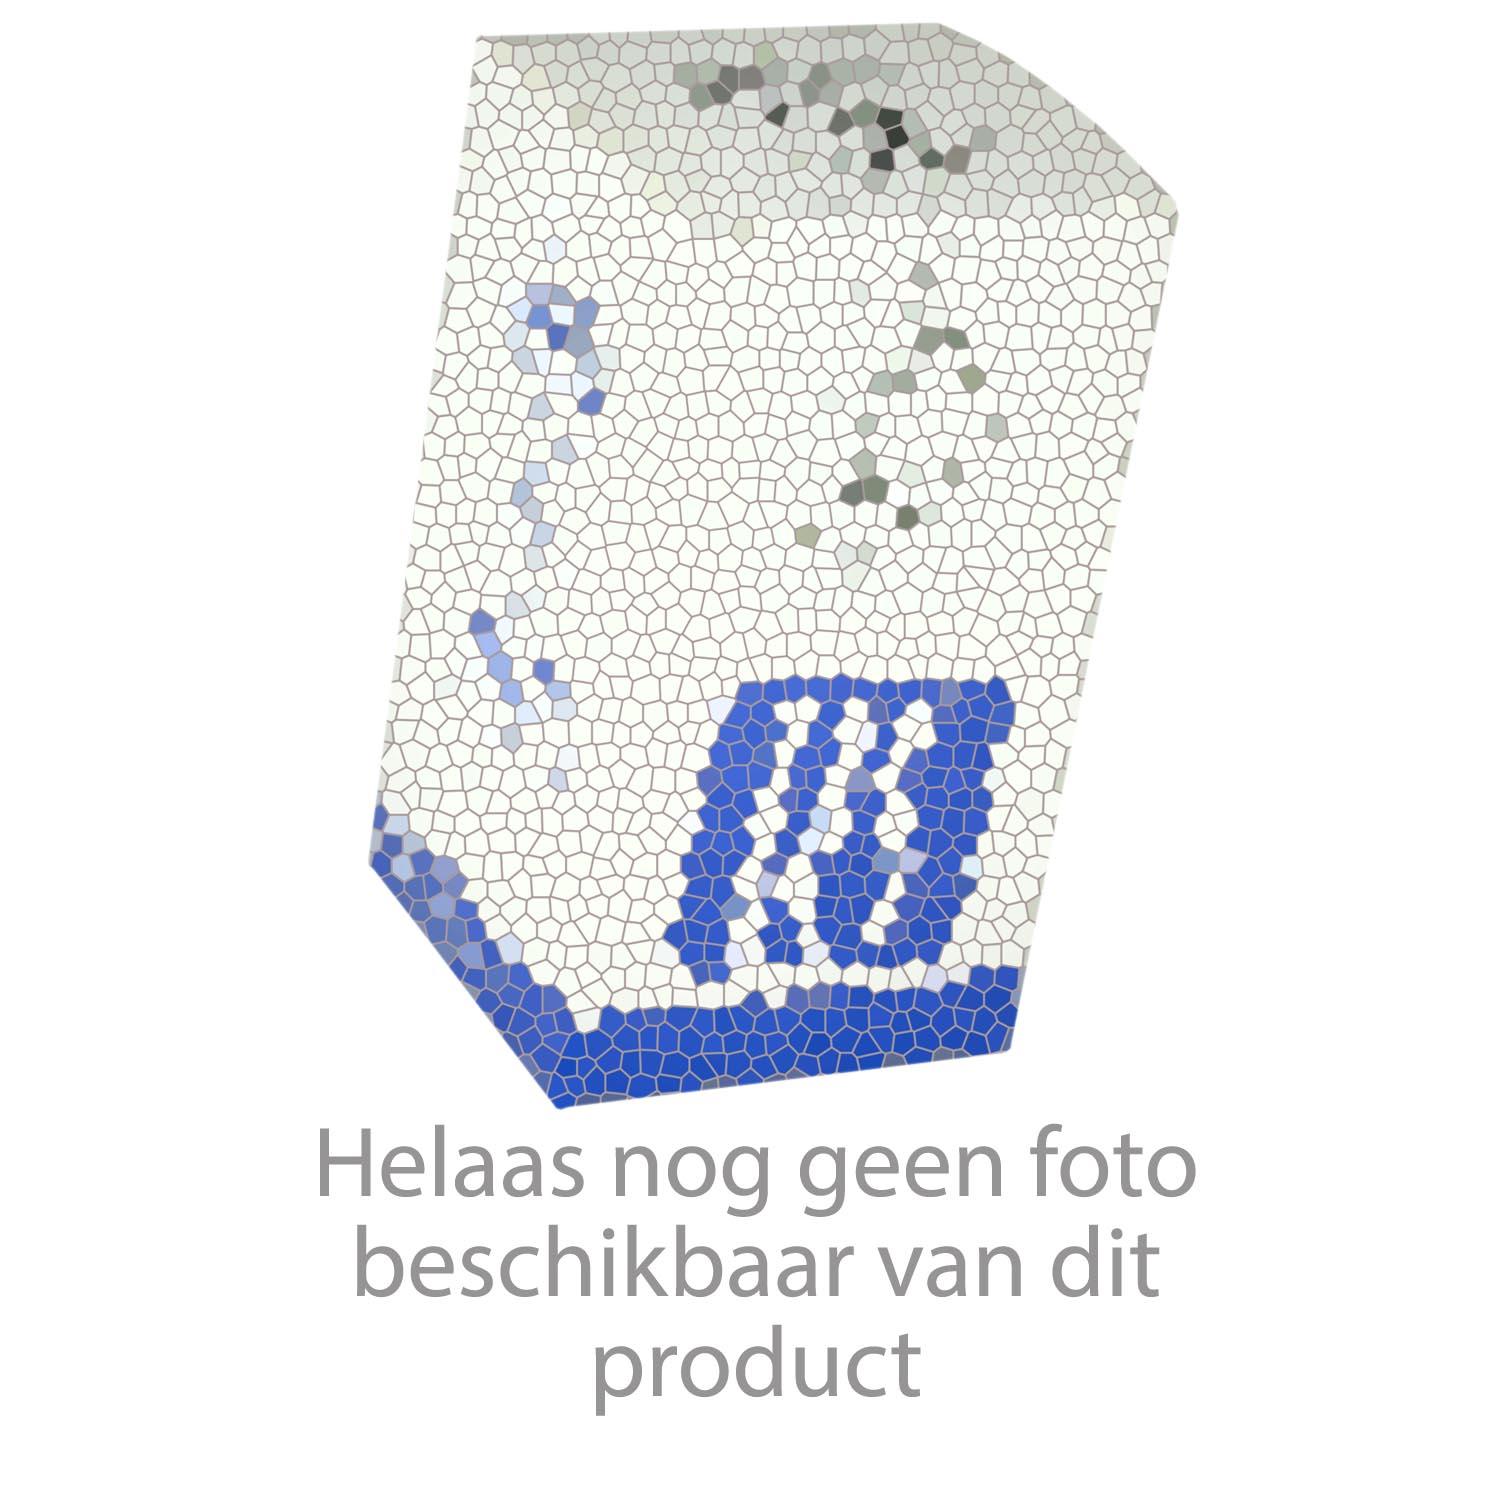 Echtermann EUROCLEAN wandmodel 1-hendel mengkraan geen tussenkraan Artikel nummer 6647.10